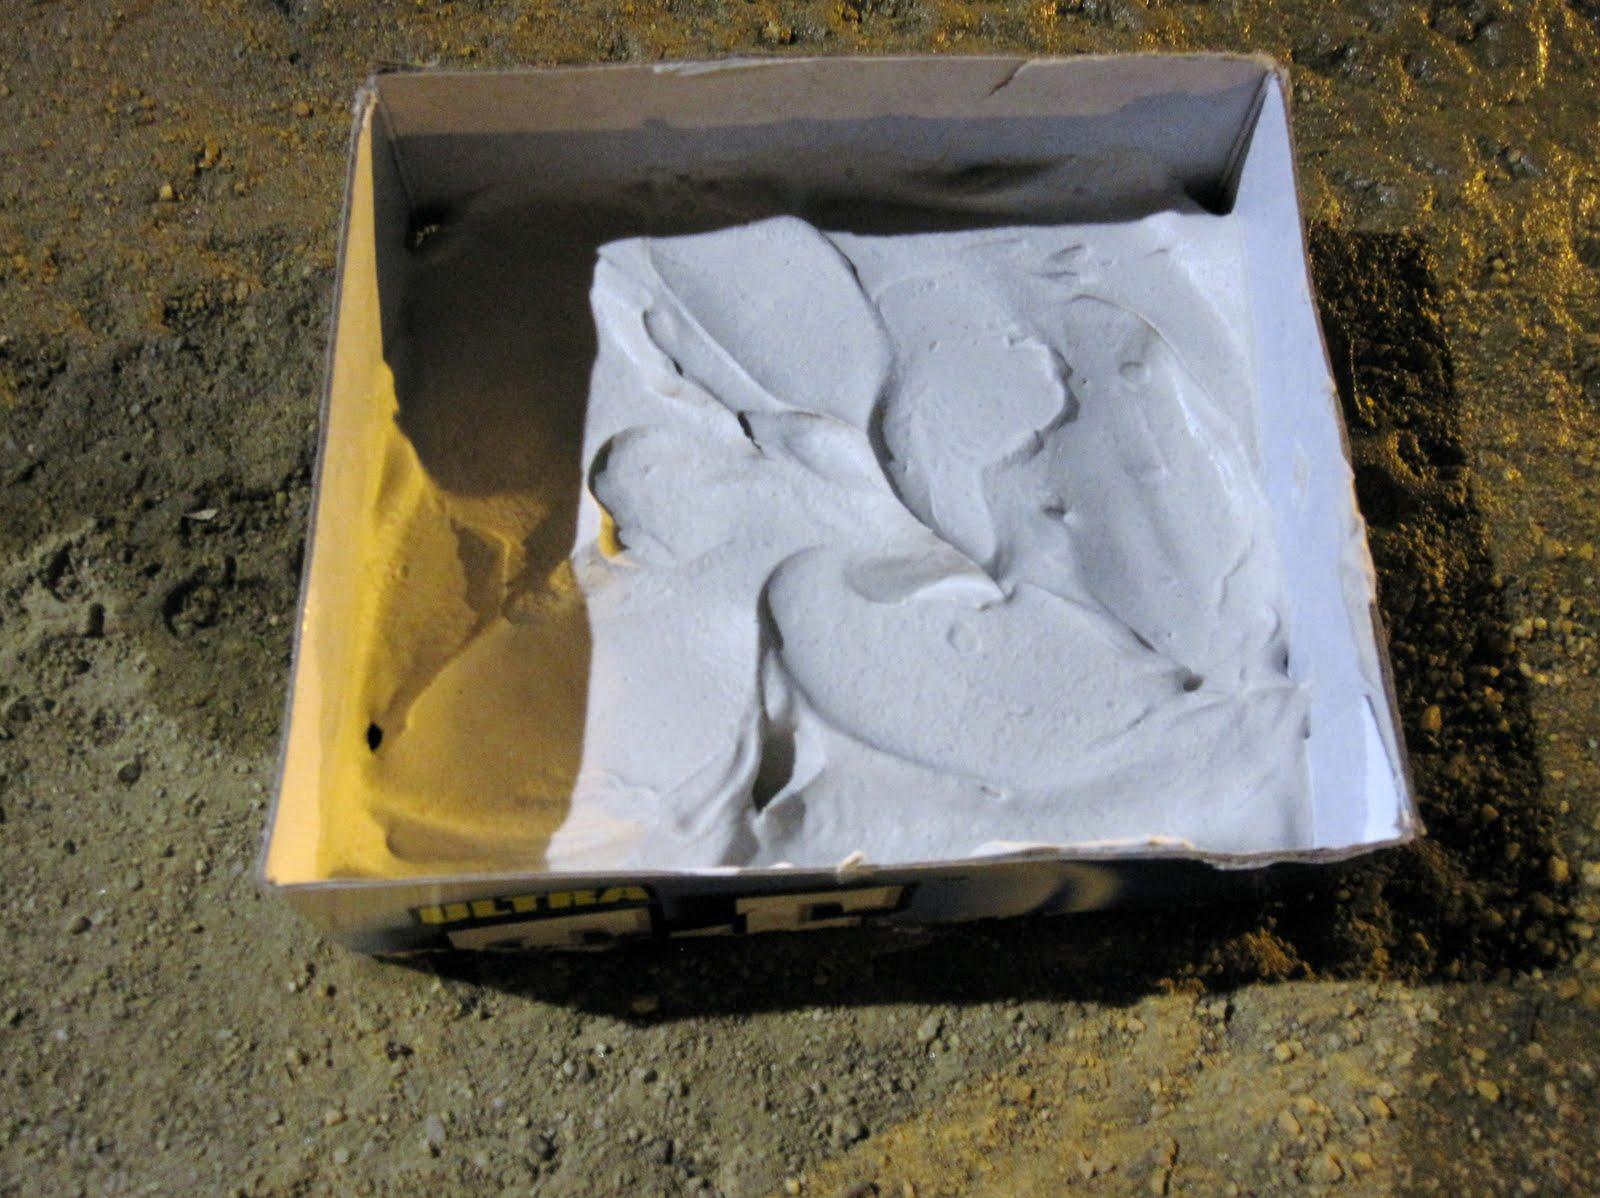 Tire Plaster Castings : Fun science for girls plaster casts secrets of tracks